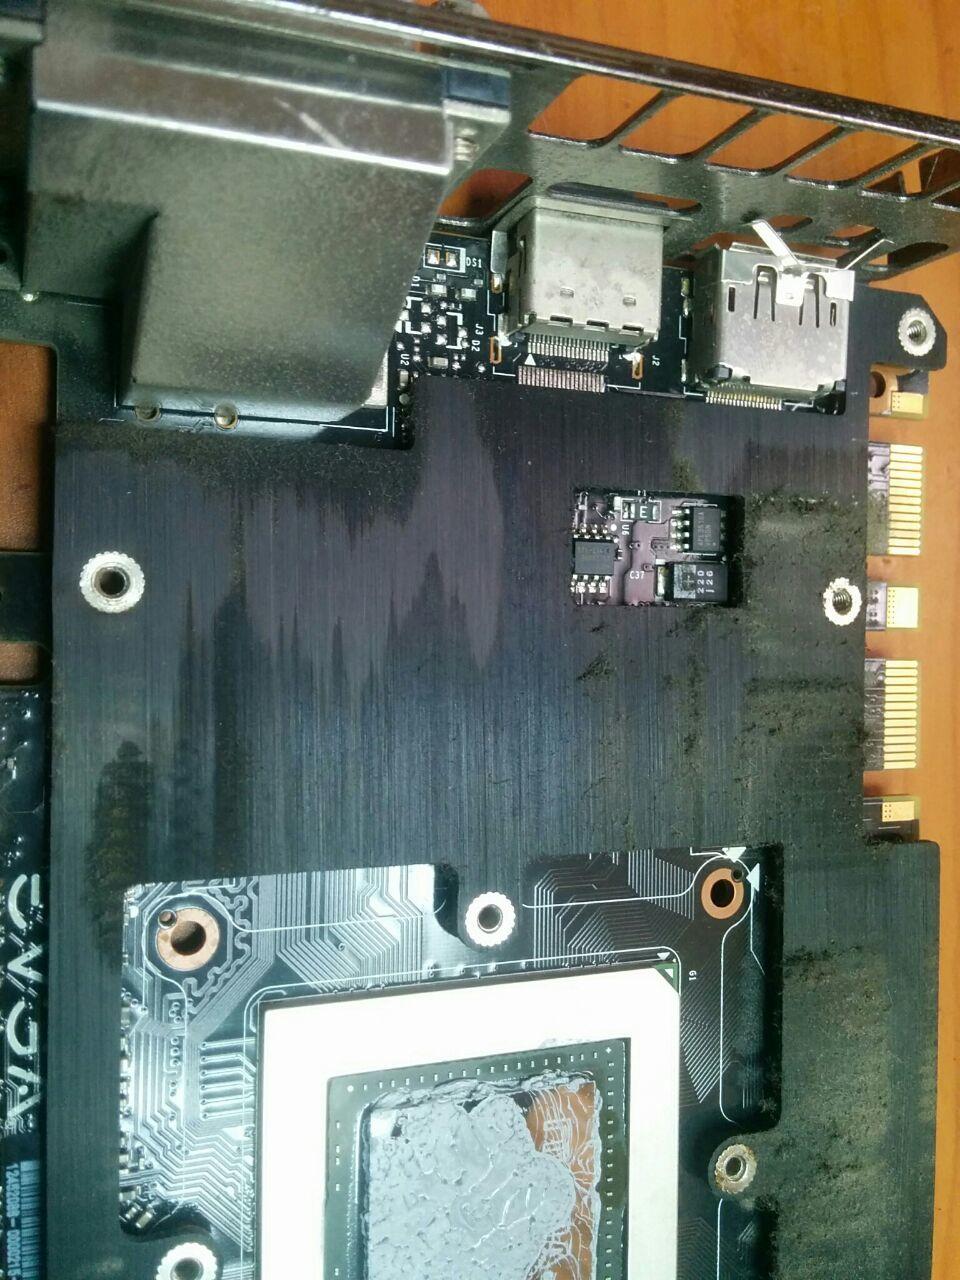 Help: Messing around with video drivers has bricked GPU - GPU